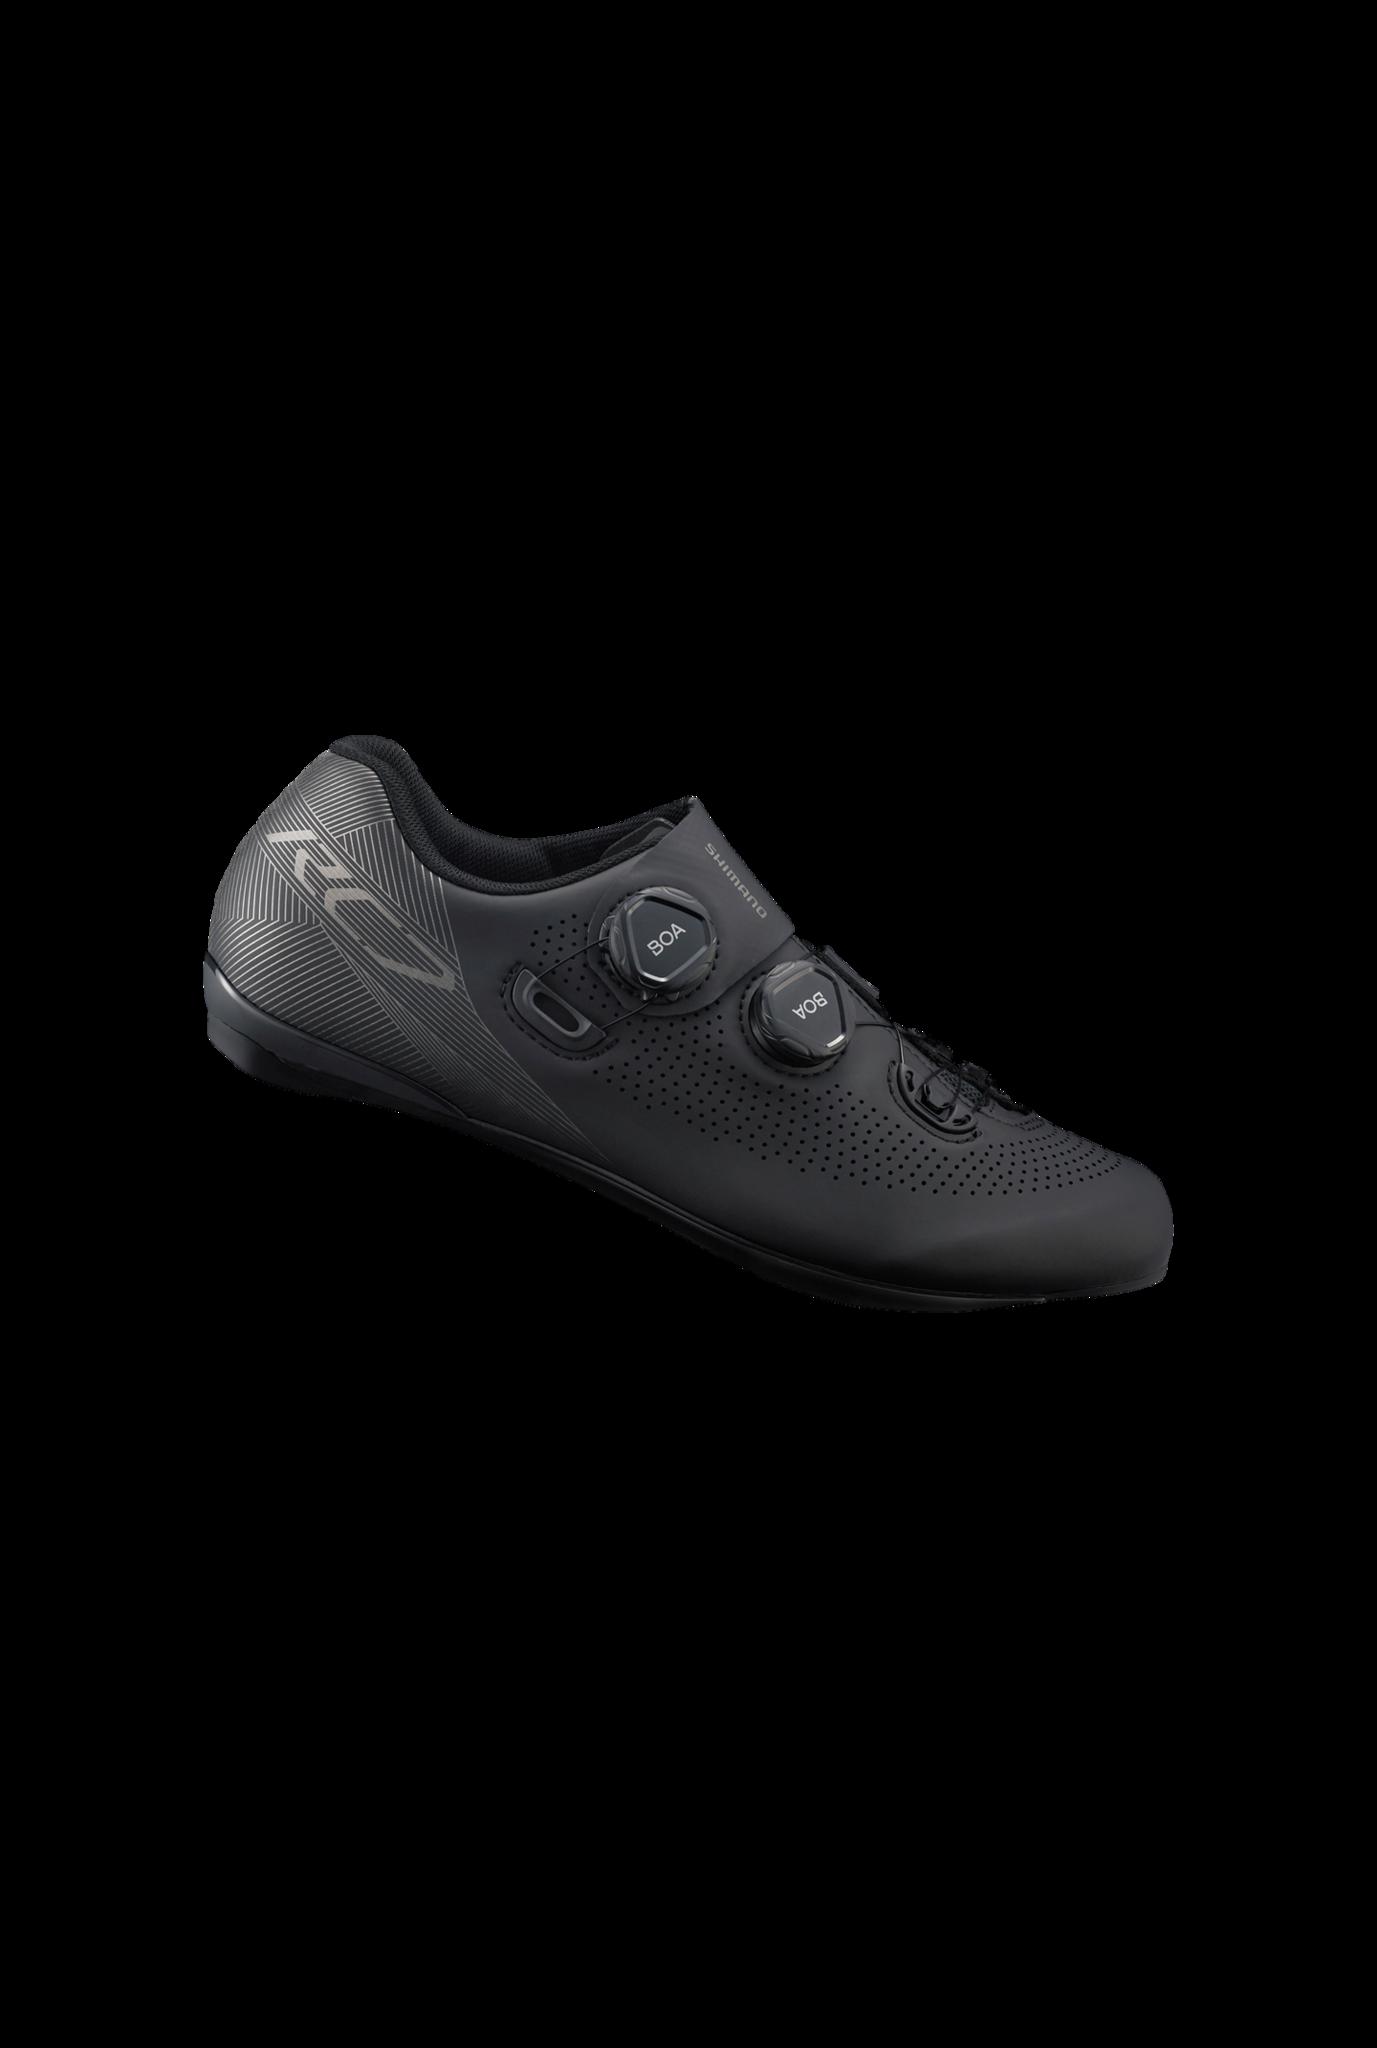 Schoenen RC701 Zwart-1